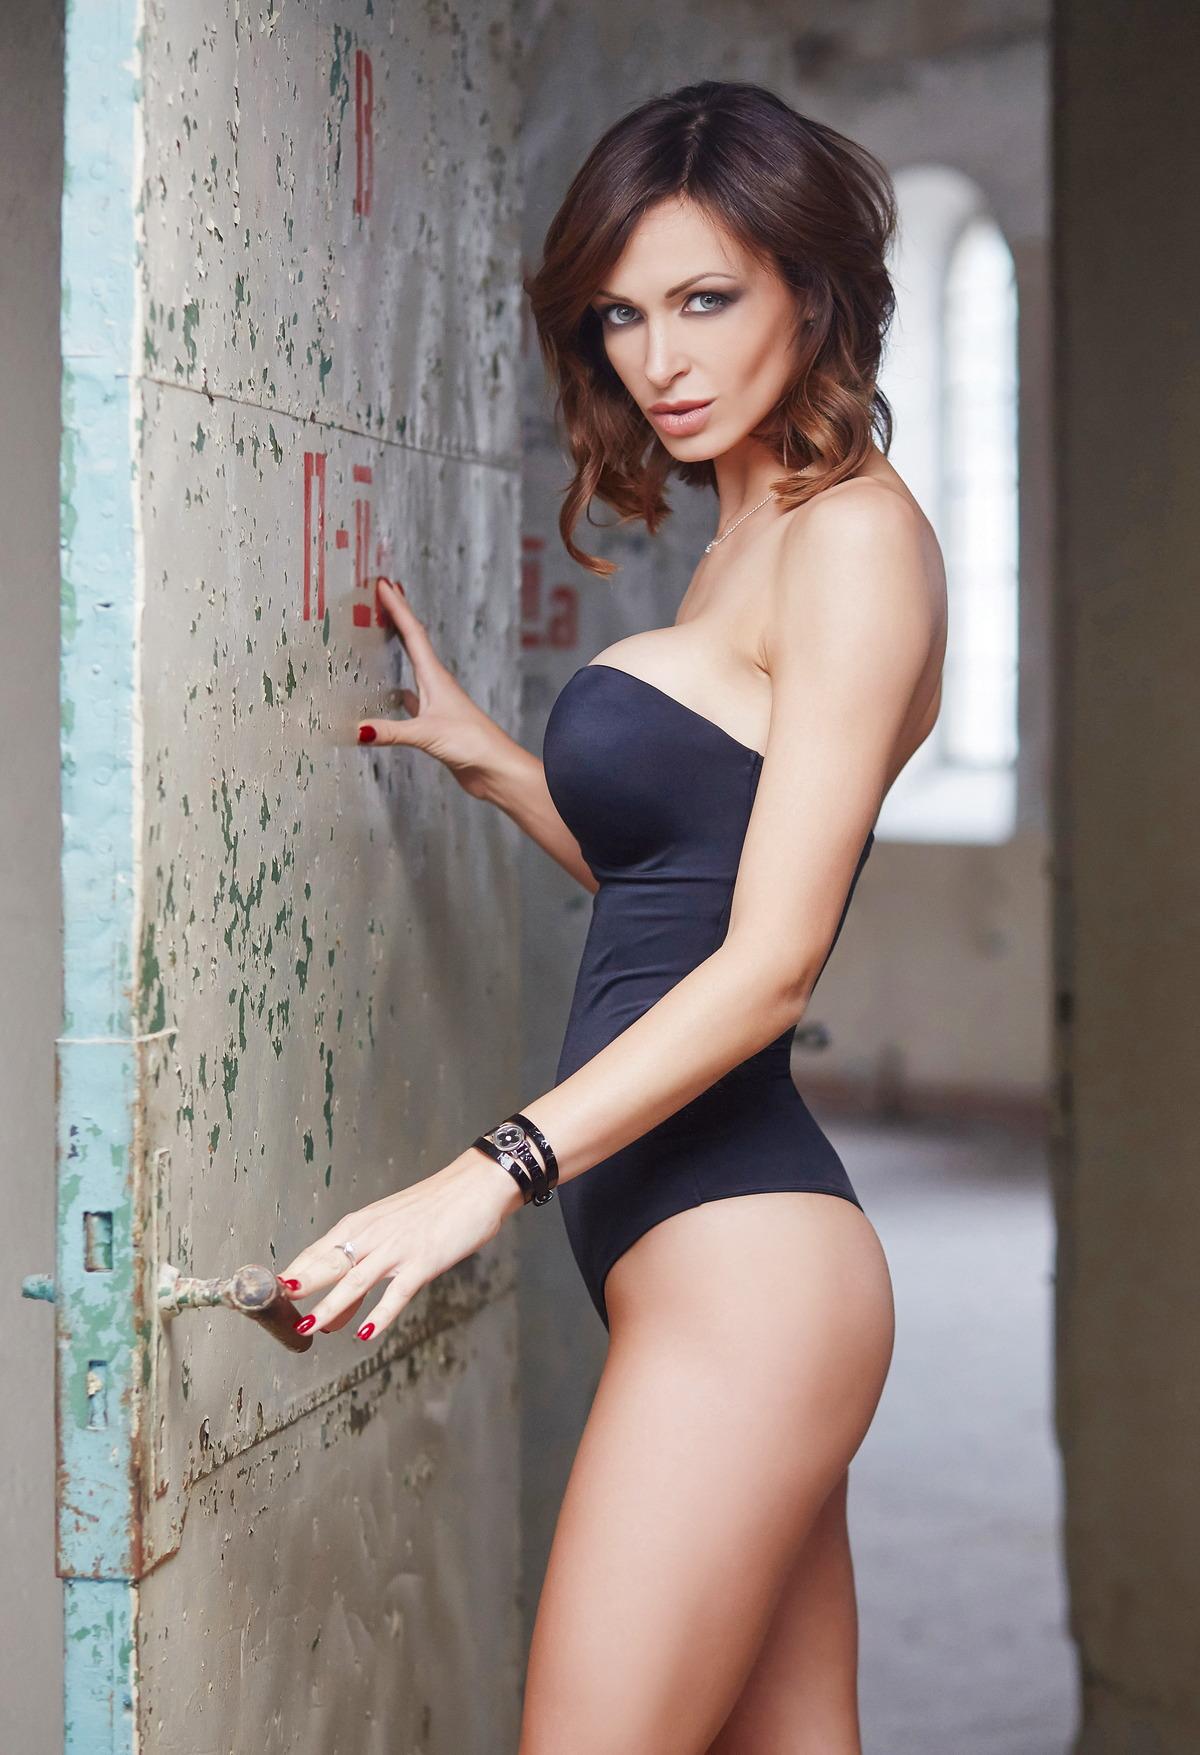 Sexy Girl öffnet Stahltür